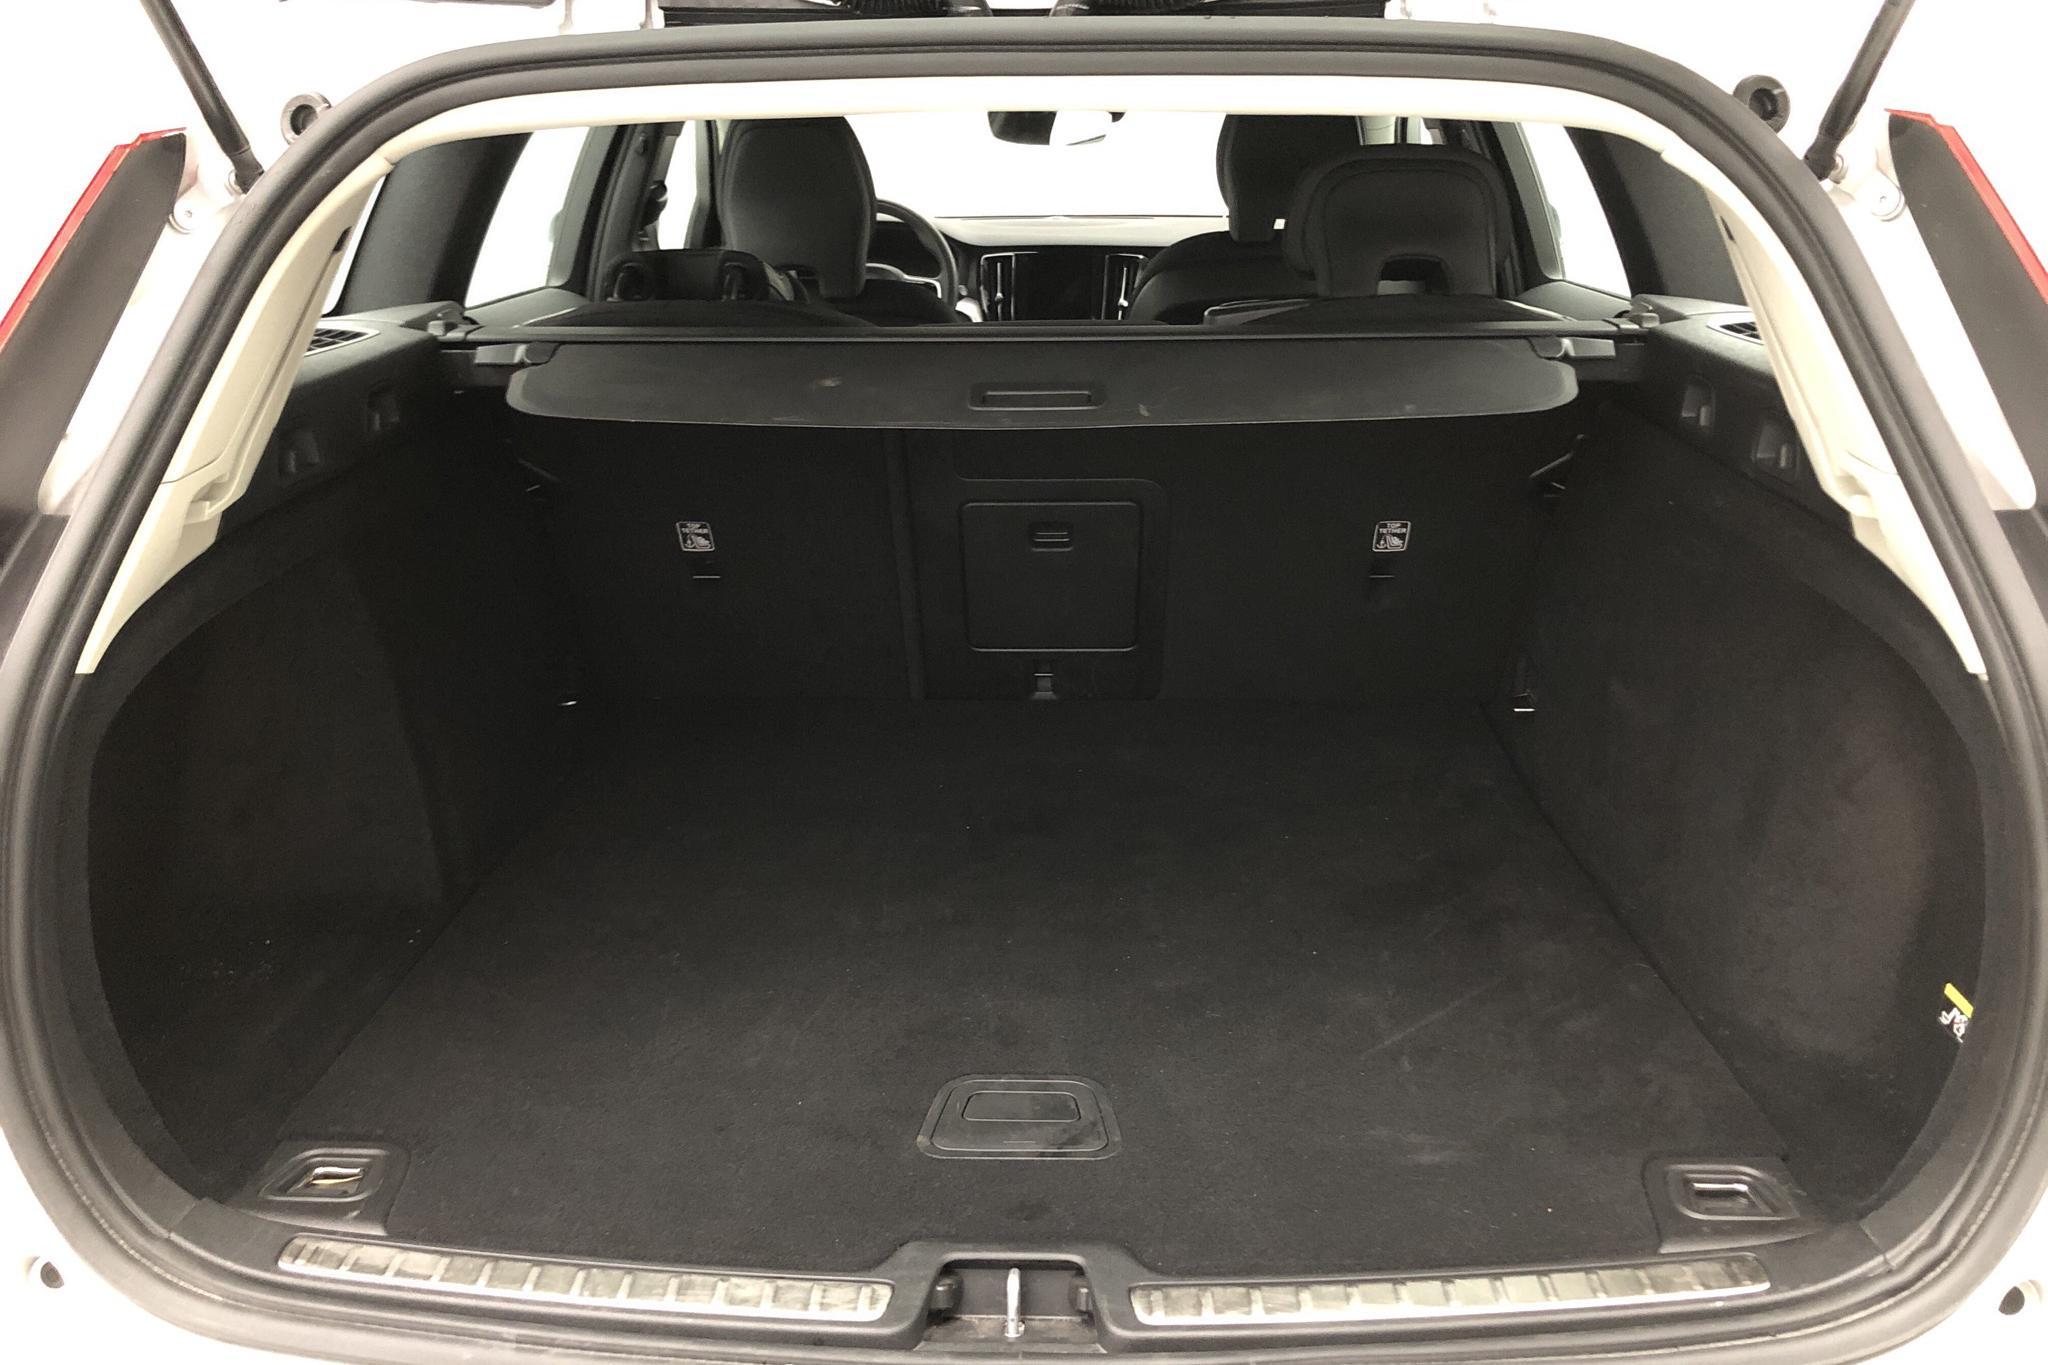 Volvo V60 D3 (150hk) - 30 780 km - Automatic - silver - 2019